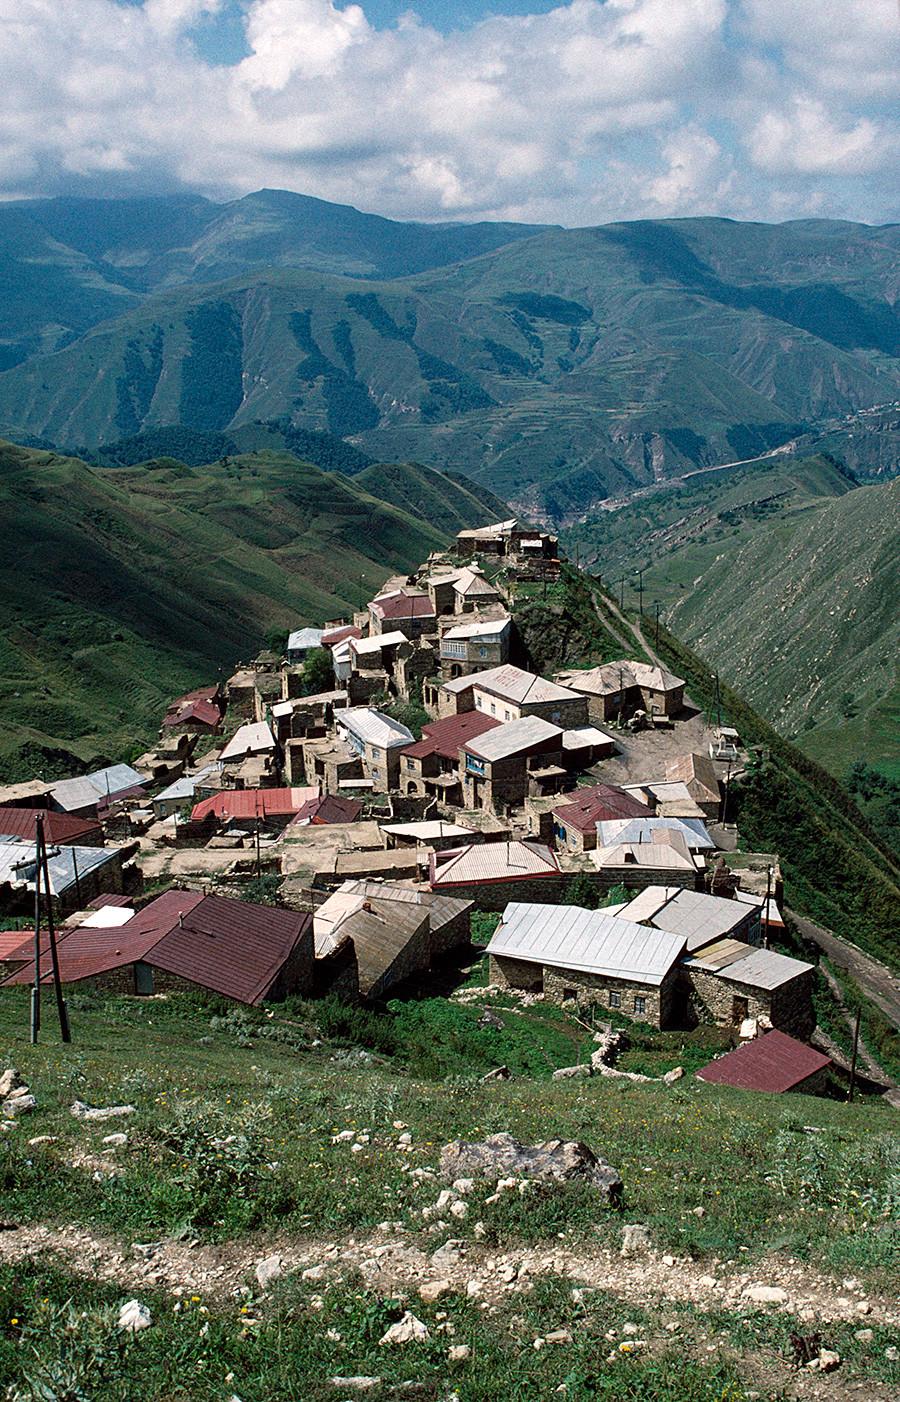 Дагестанский караван-сарай на старом Шёлковом пути.